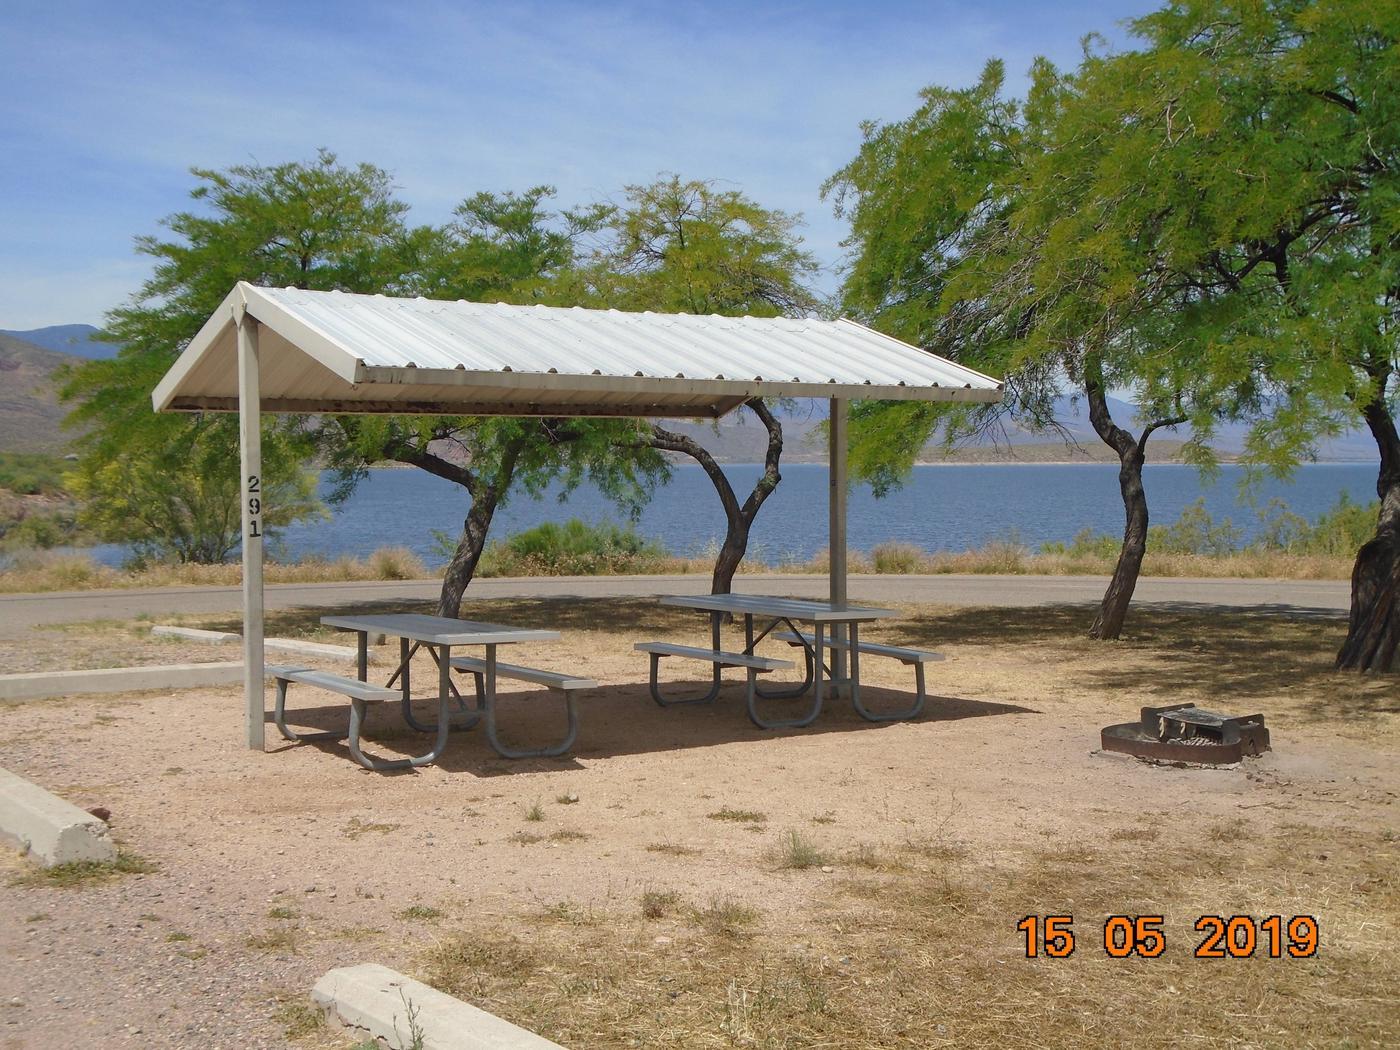 Campsite 291Windy Hill Campground